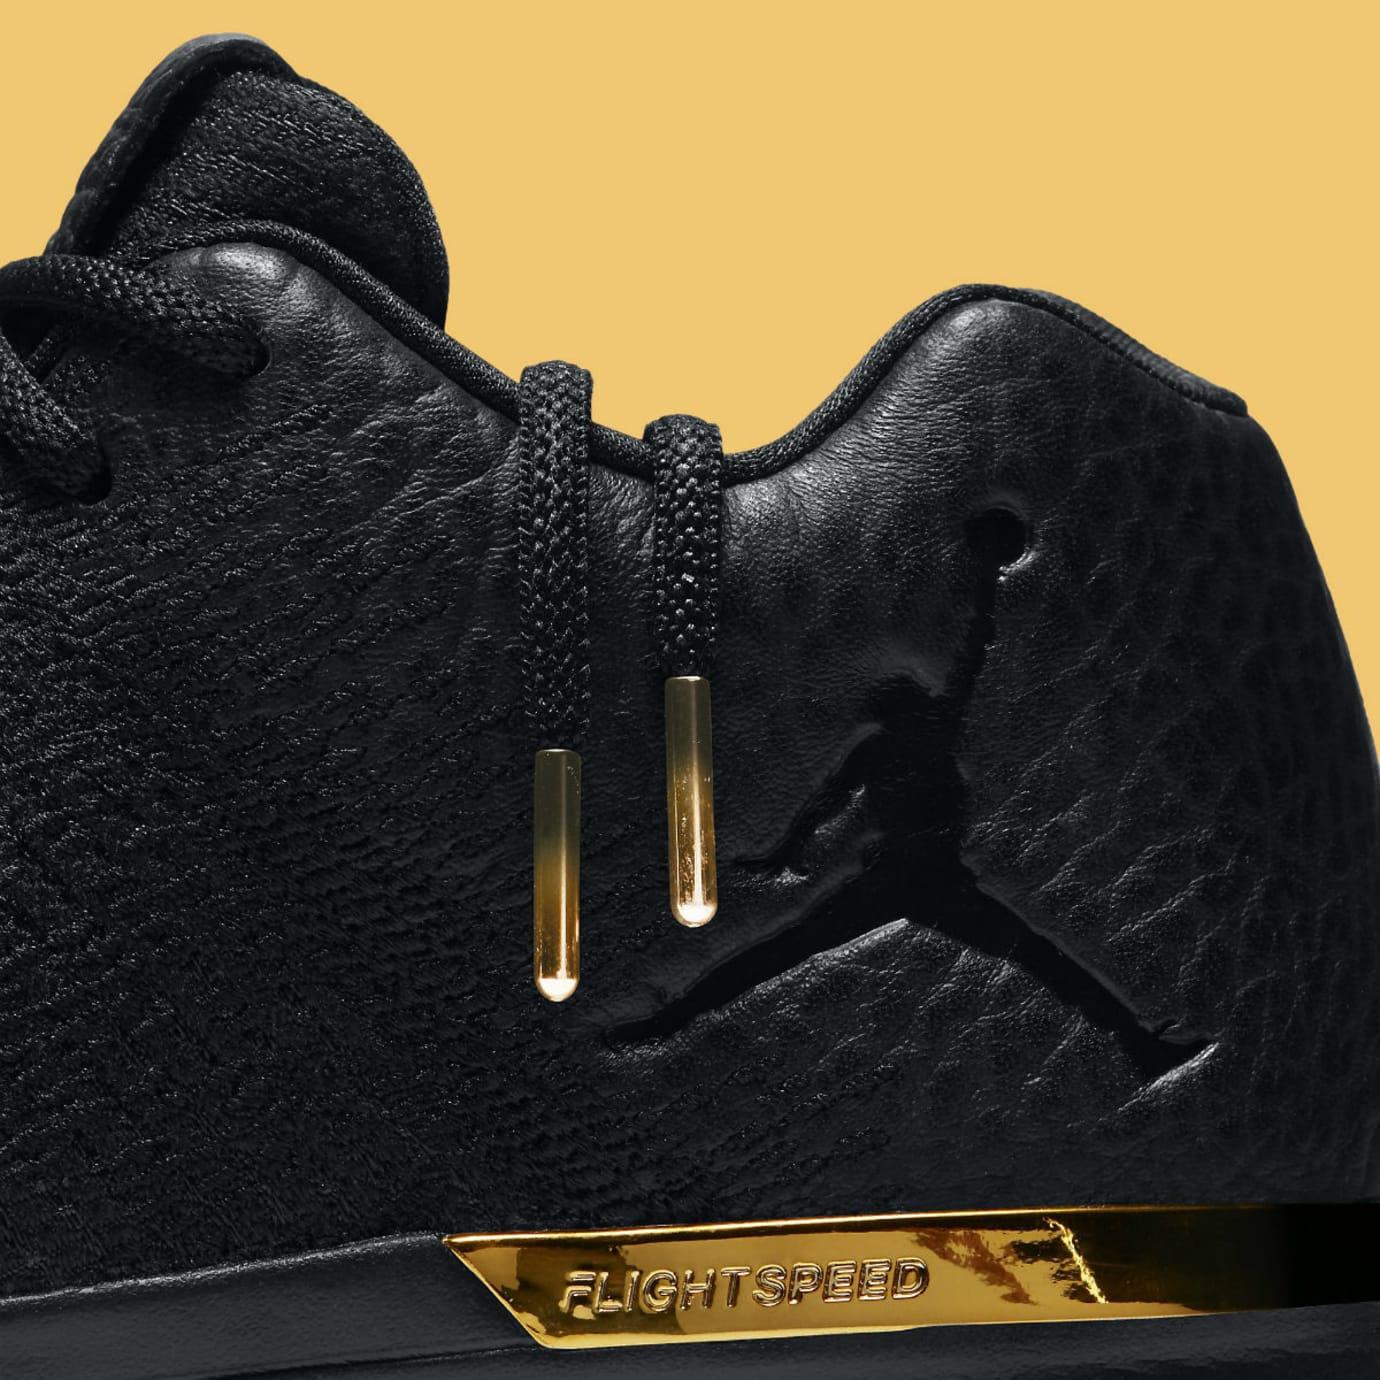 Air Jordan 31 Low Black/Gold Release Date Laces 897564-023